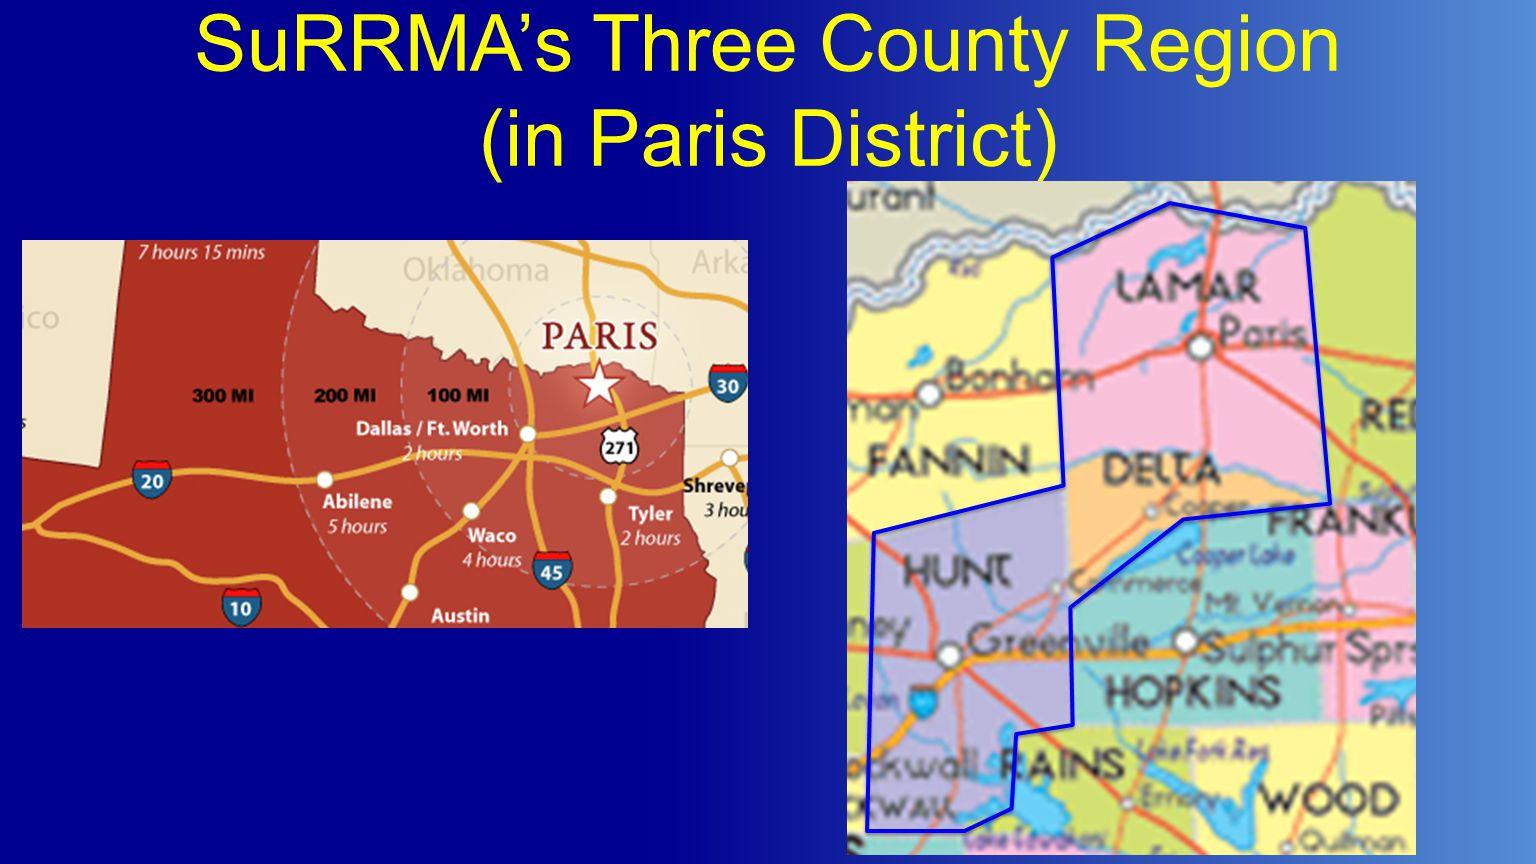 SuRRMA's Three County Region (in Paris District)